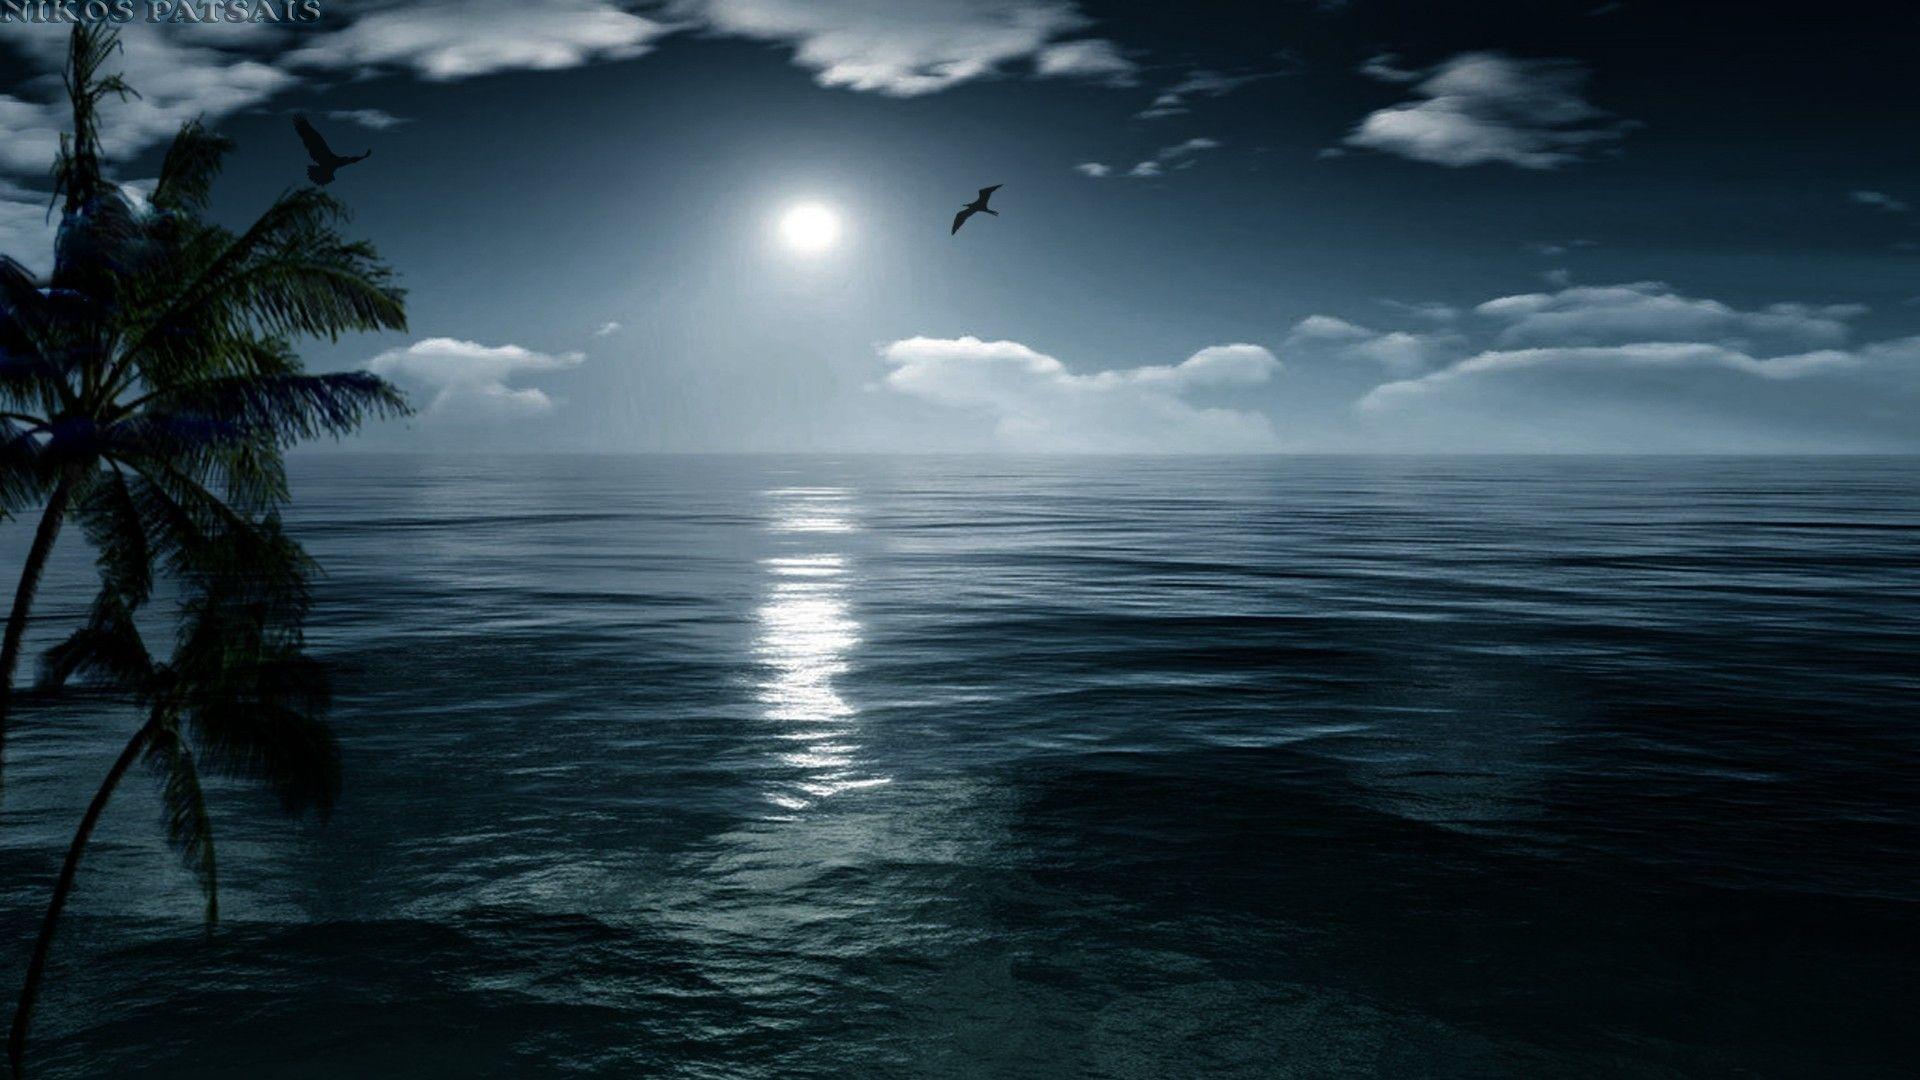 Res 1920x1080 Nature Perfect Night Sea Island Moon Ocean Moonlight Hd Wallpaper Iphone Ocean Wallpaper Sunset Wallpaper Landscape Wallpaper